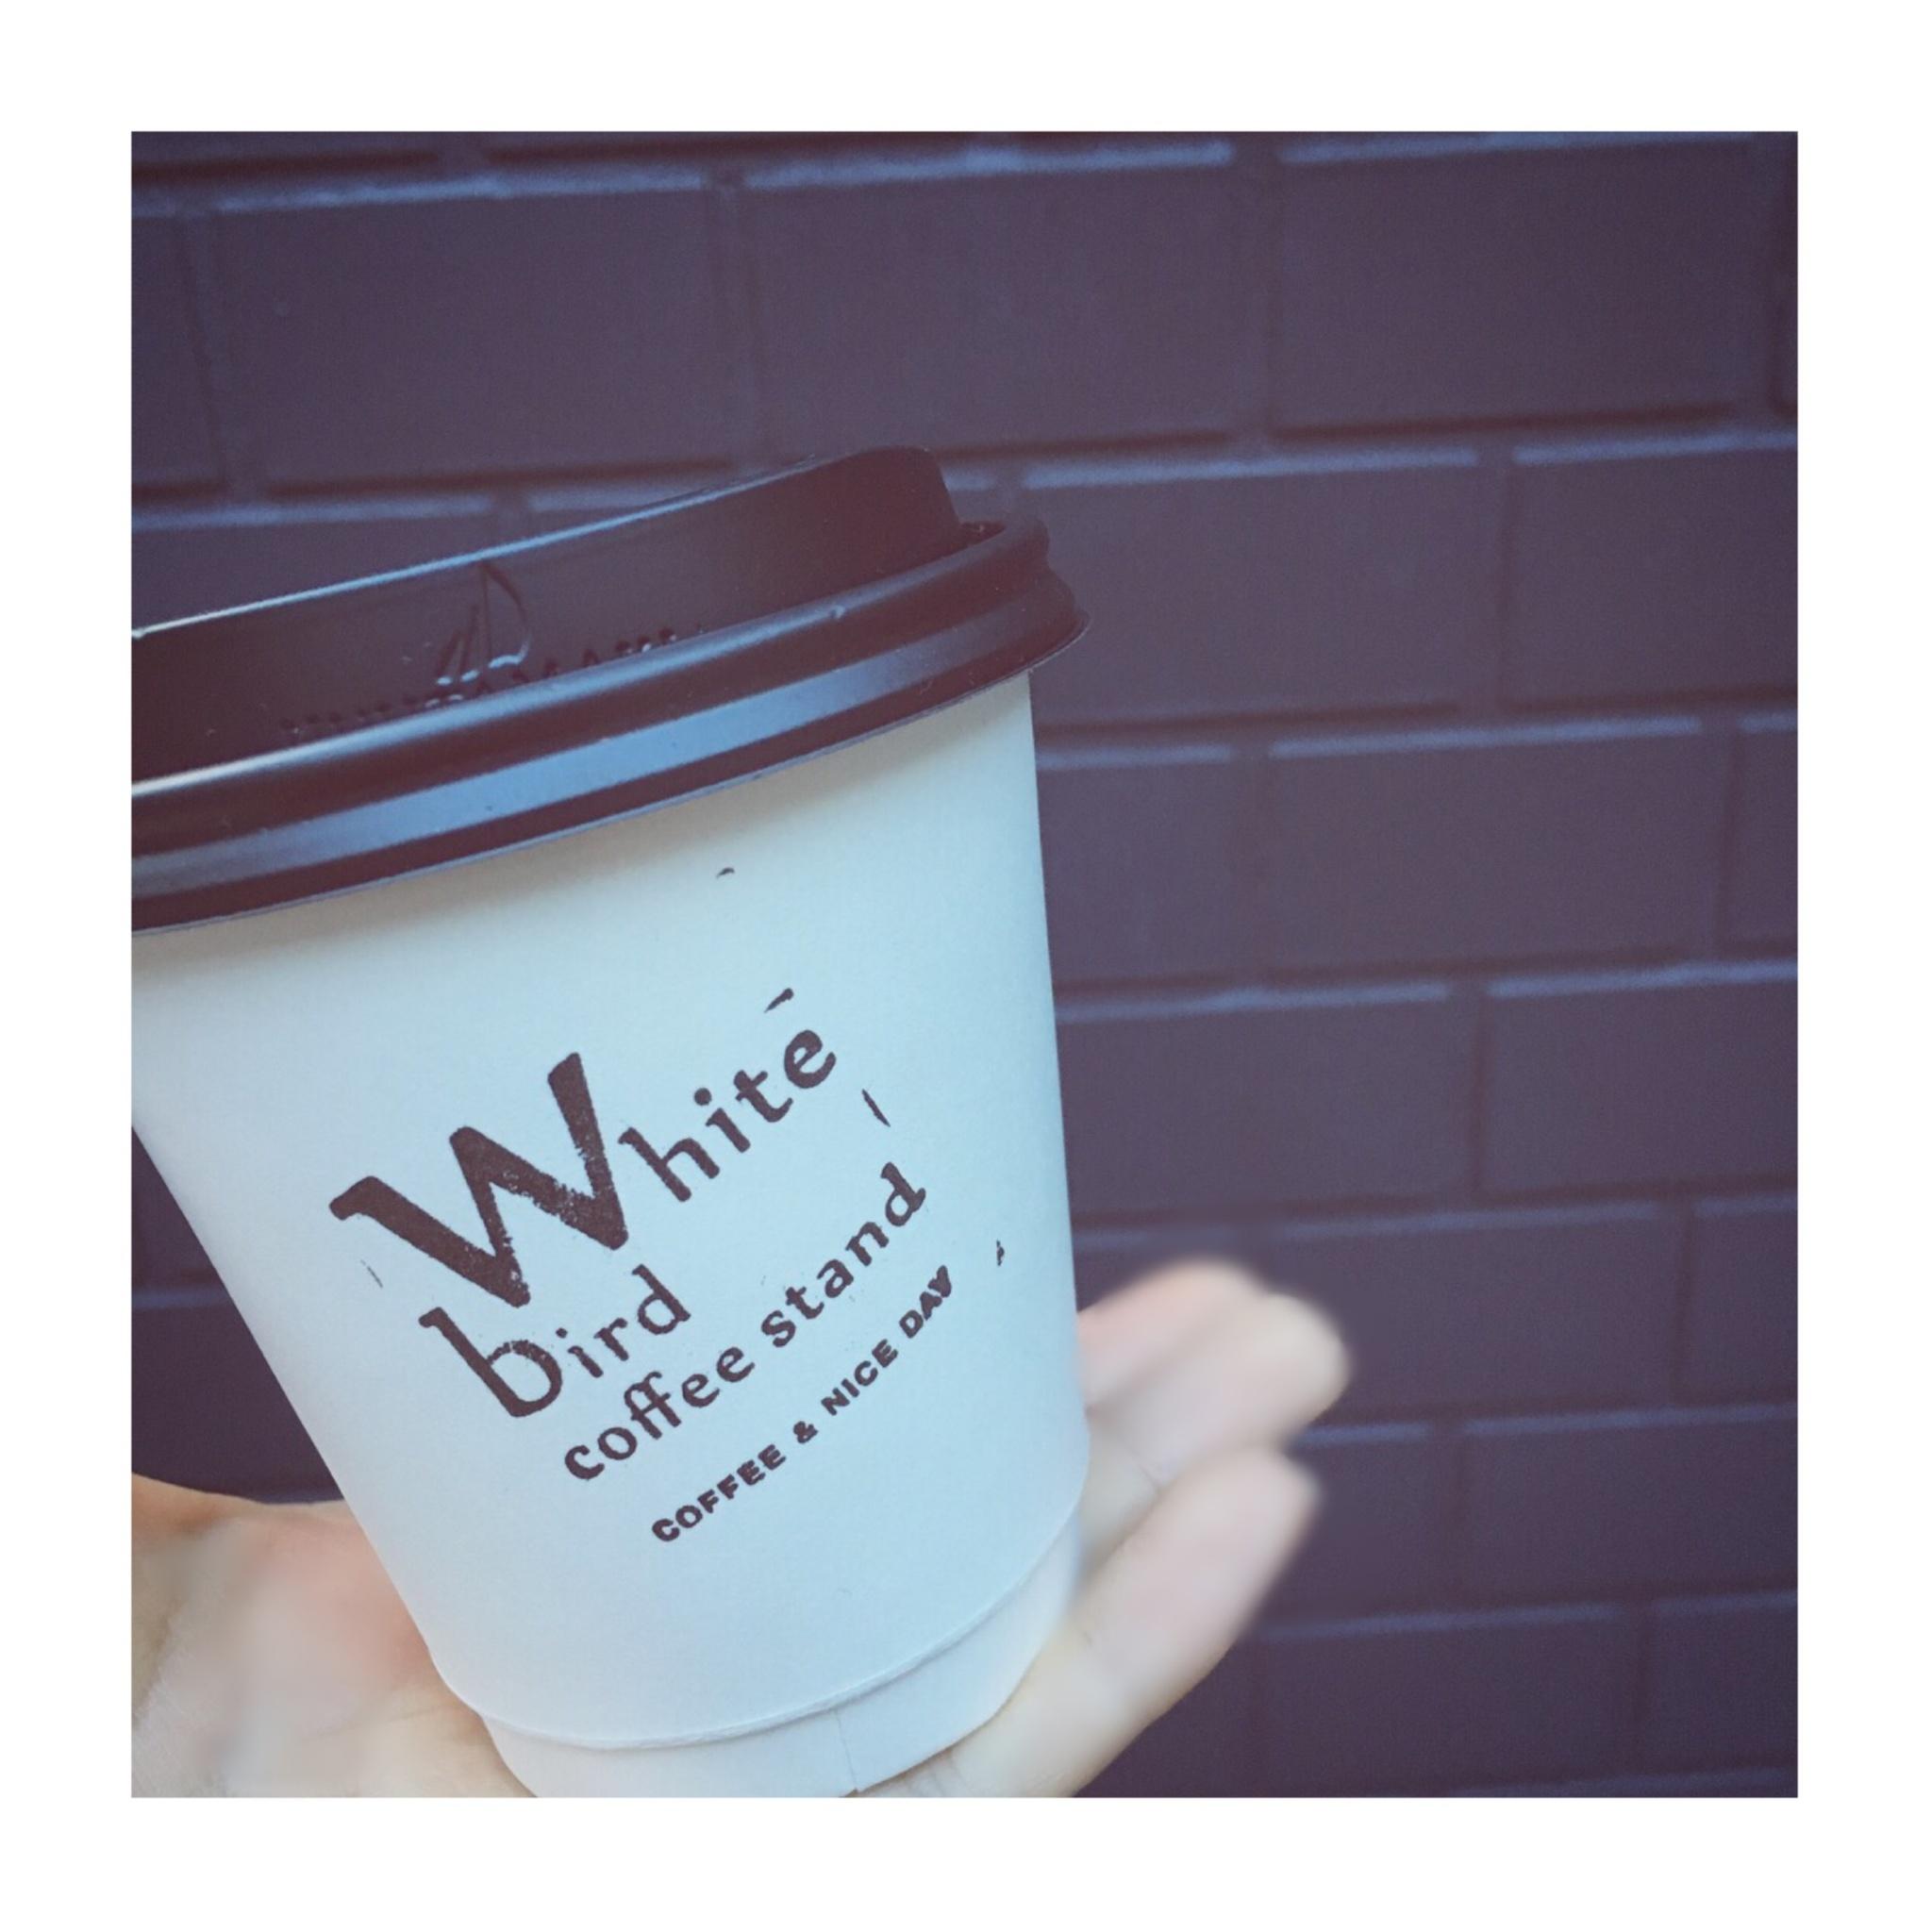 #7【#cafestagram】❤️:《大阪•梅田》バーのようなシックな空間で落ち着くカフェタイムを*「whitebird coffee stand」☻_4